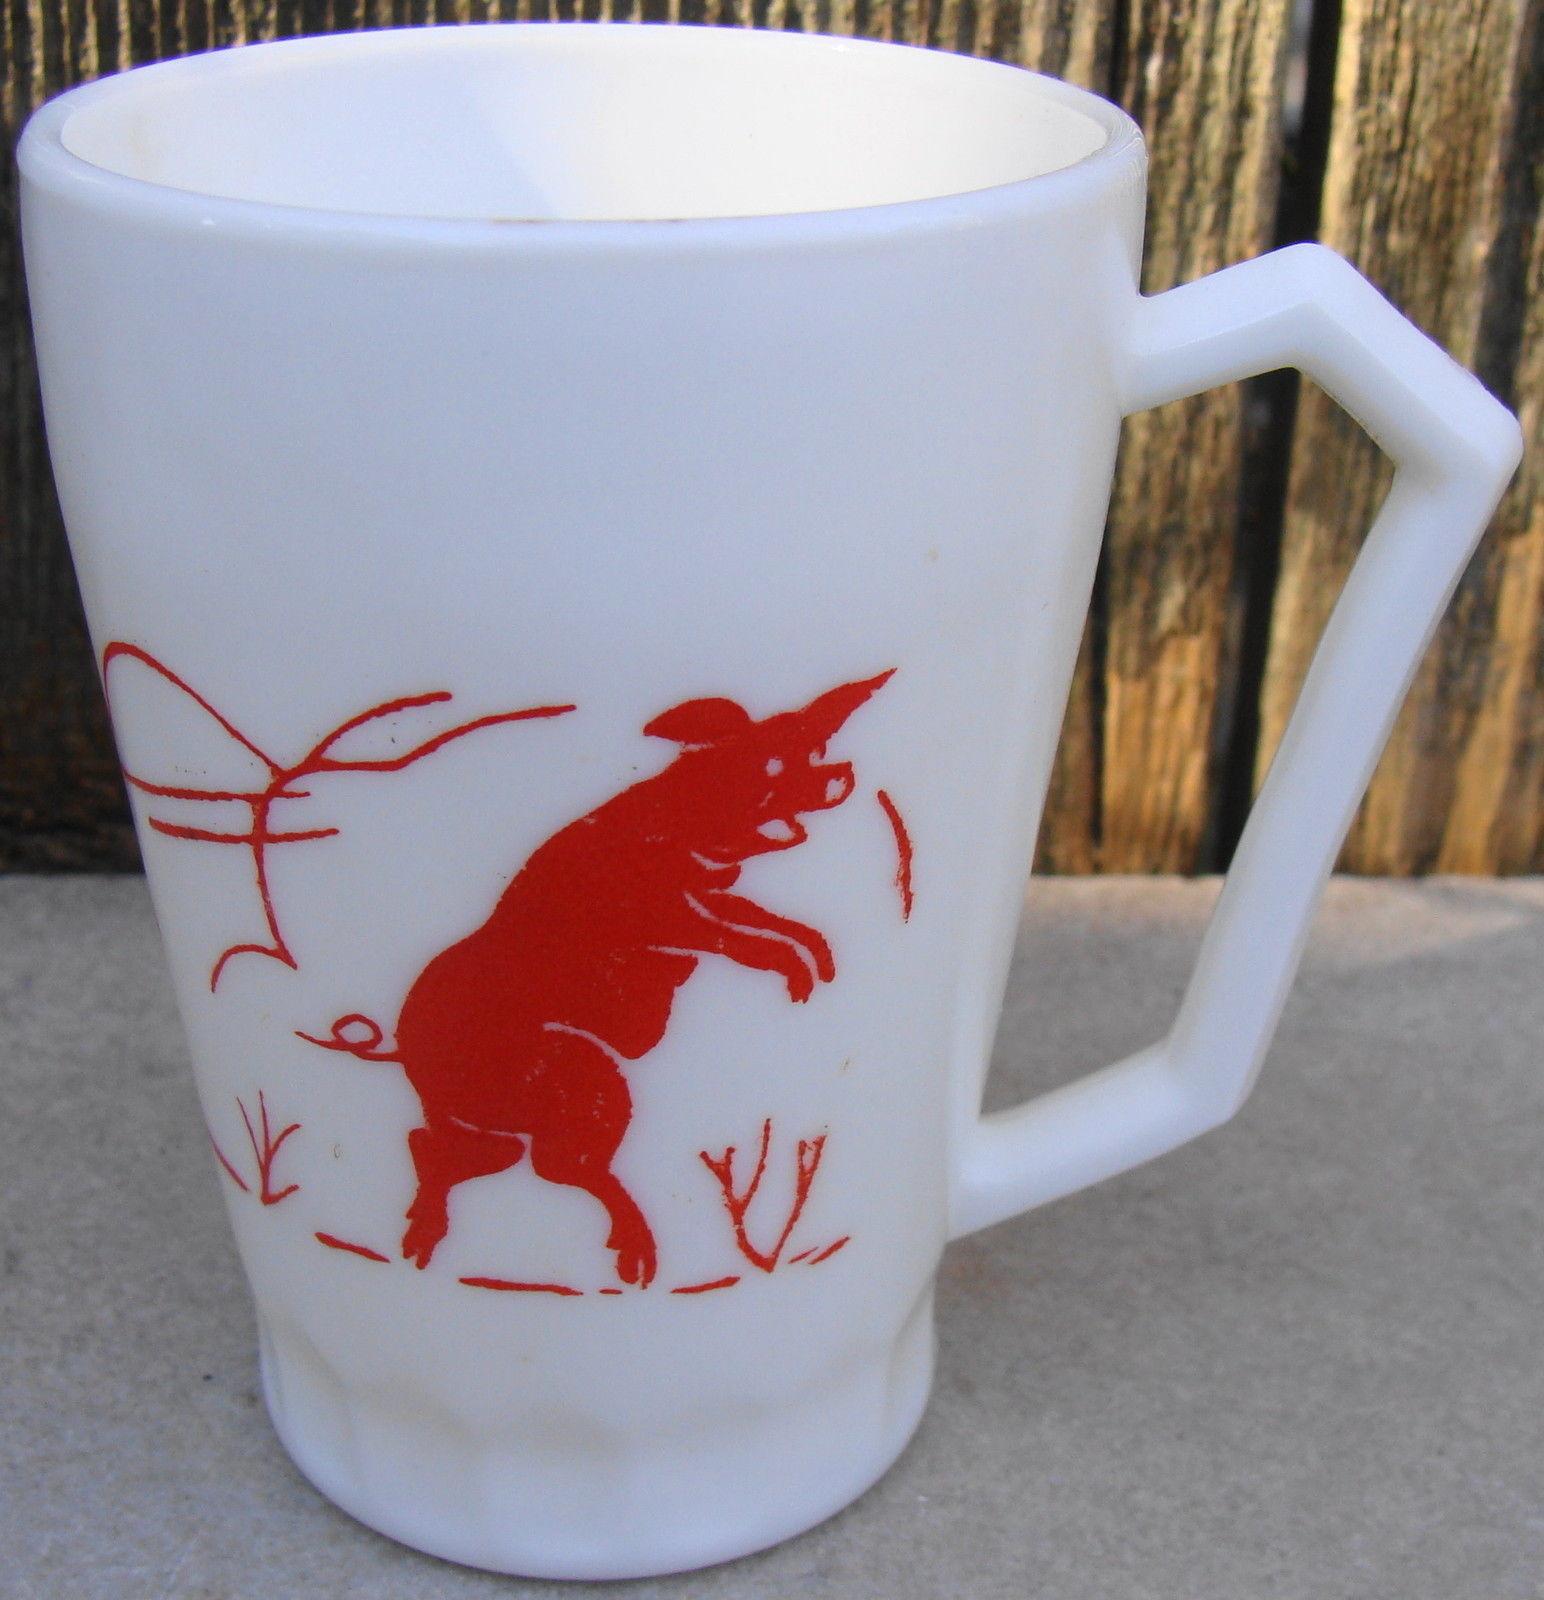 HAZEL ATLAS Kiddie Ware RED 3 LITTLE PIGS CUP Milk Glass USA - £20.21 GBP